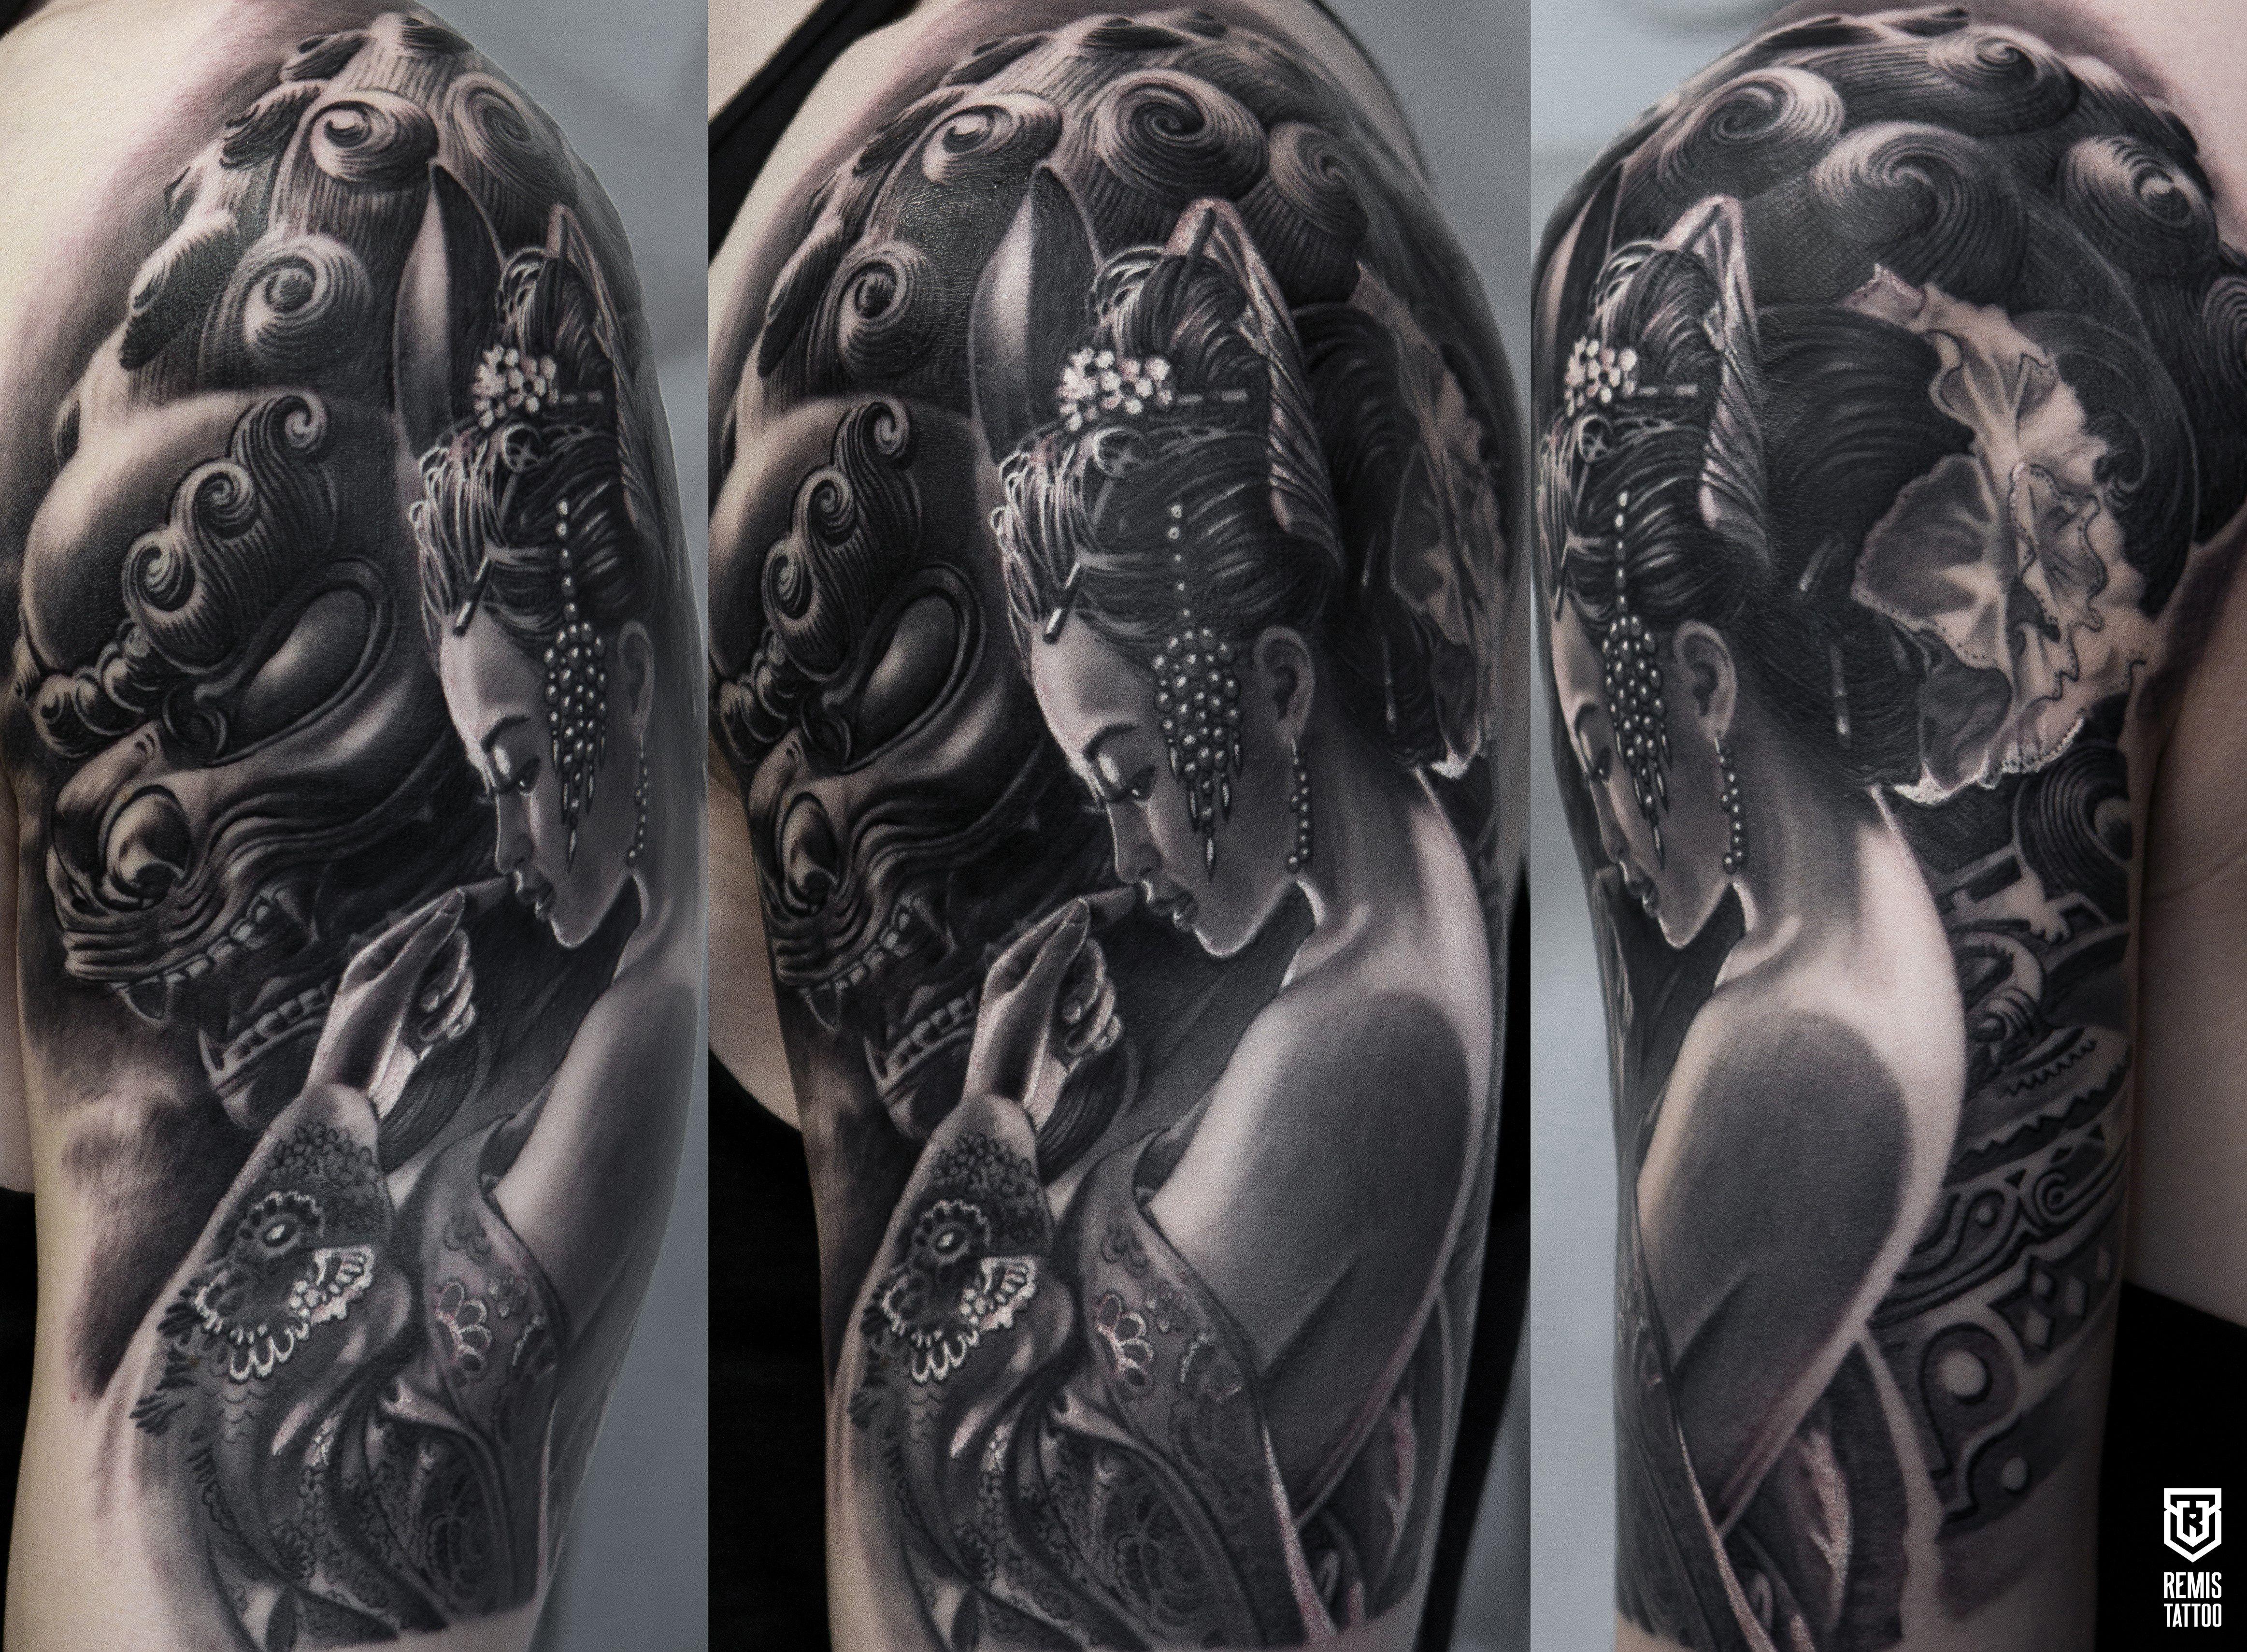 Geisha Tattoo Japanese Tattoo Fudog Tattoo Realistic Tattoo Dublin Tattoo Ireland Tattoo Tattoo Inspiration Geisha Tattoo Design Geisha Tattoo Tattoos